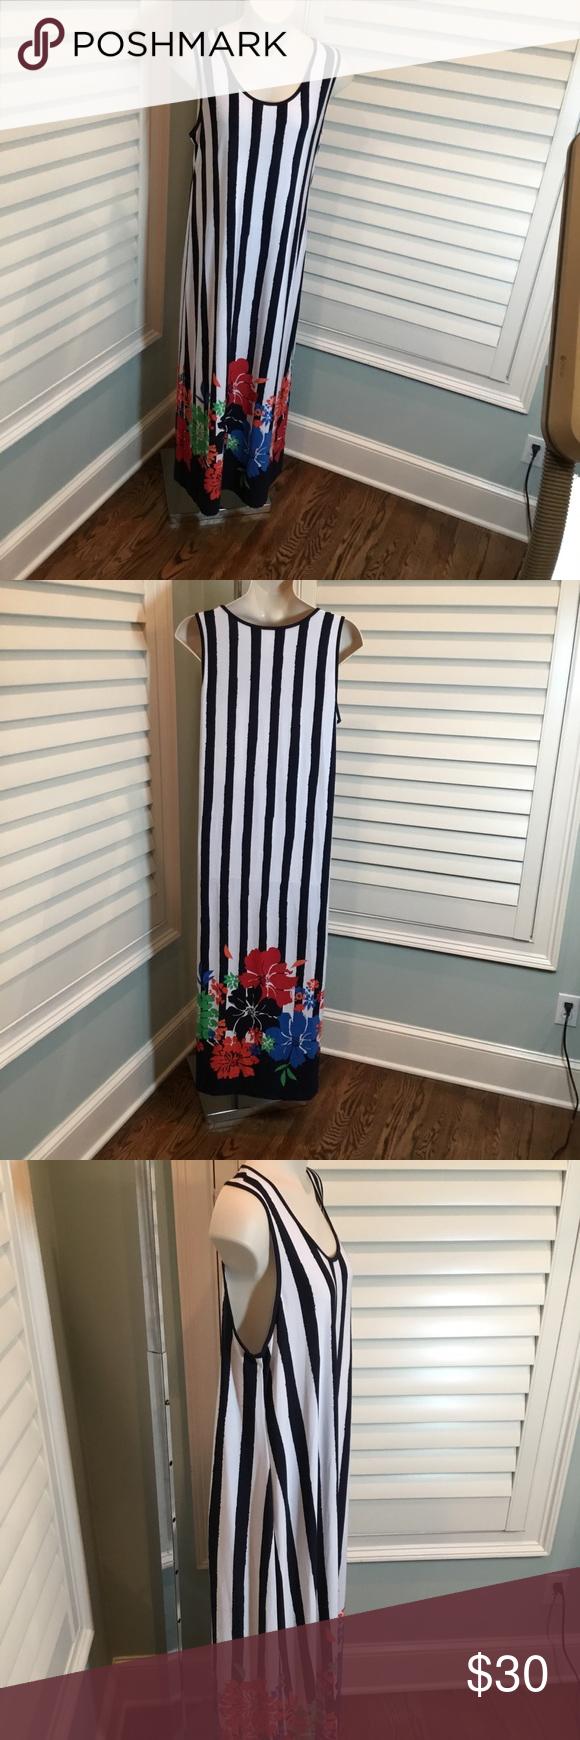 Final clearance ruby rd floral maxi dress size xl my posh closet